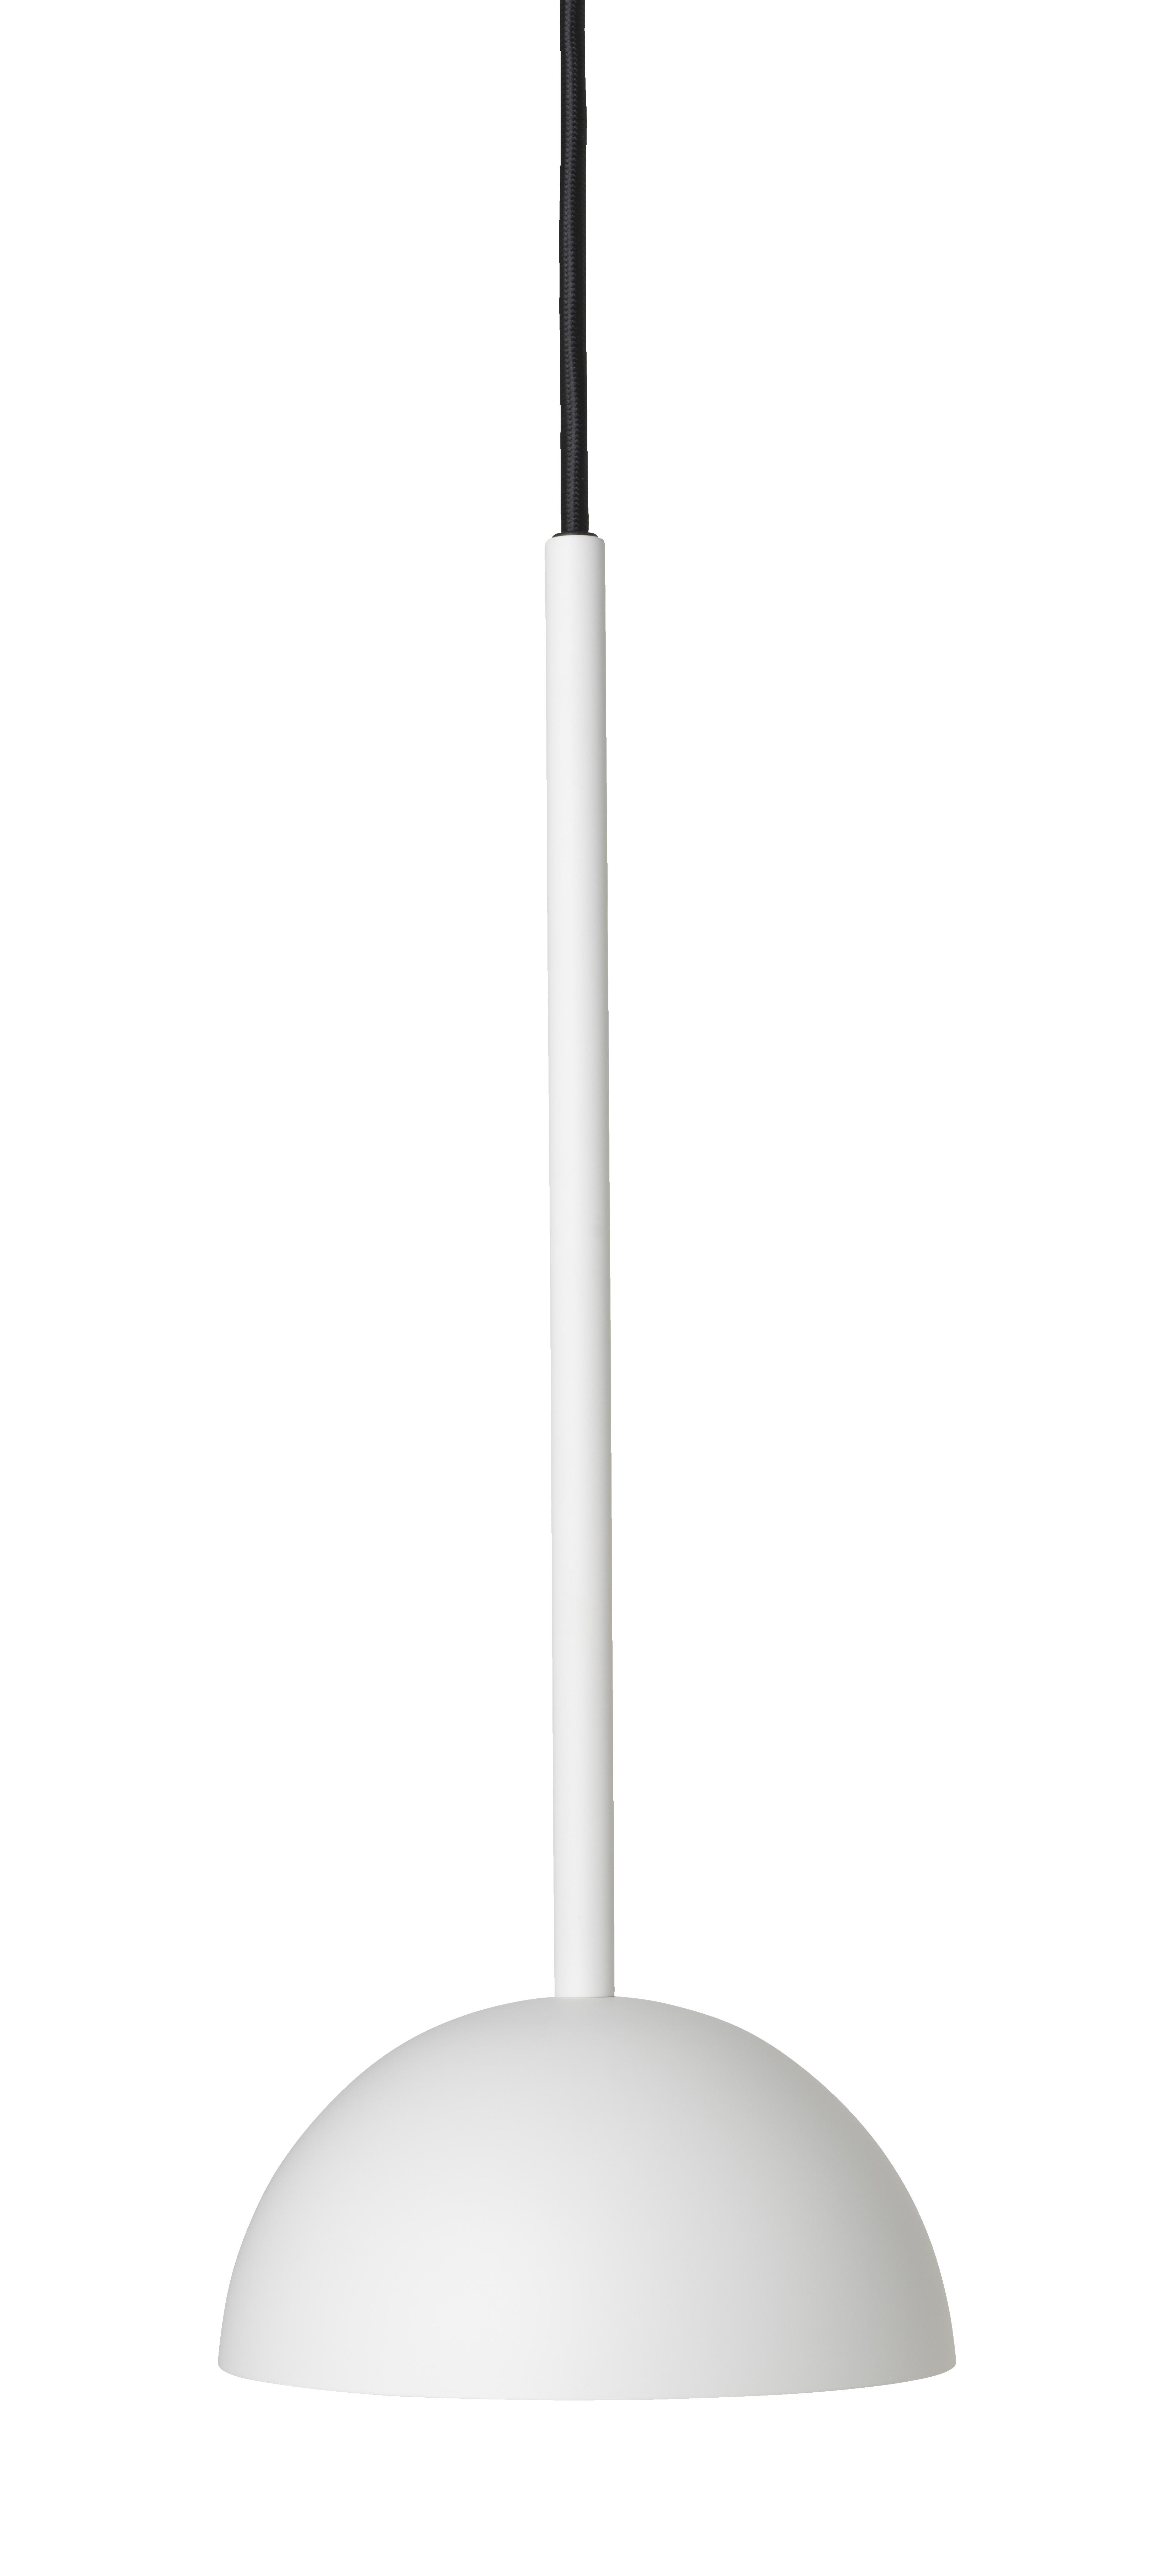 MO330 | Taklampa